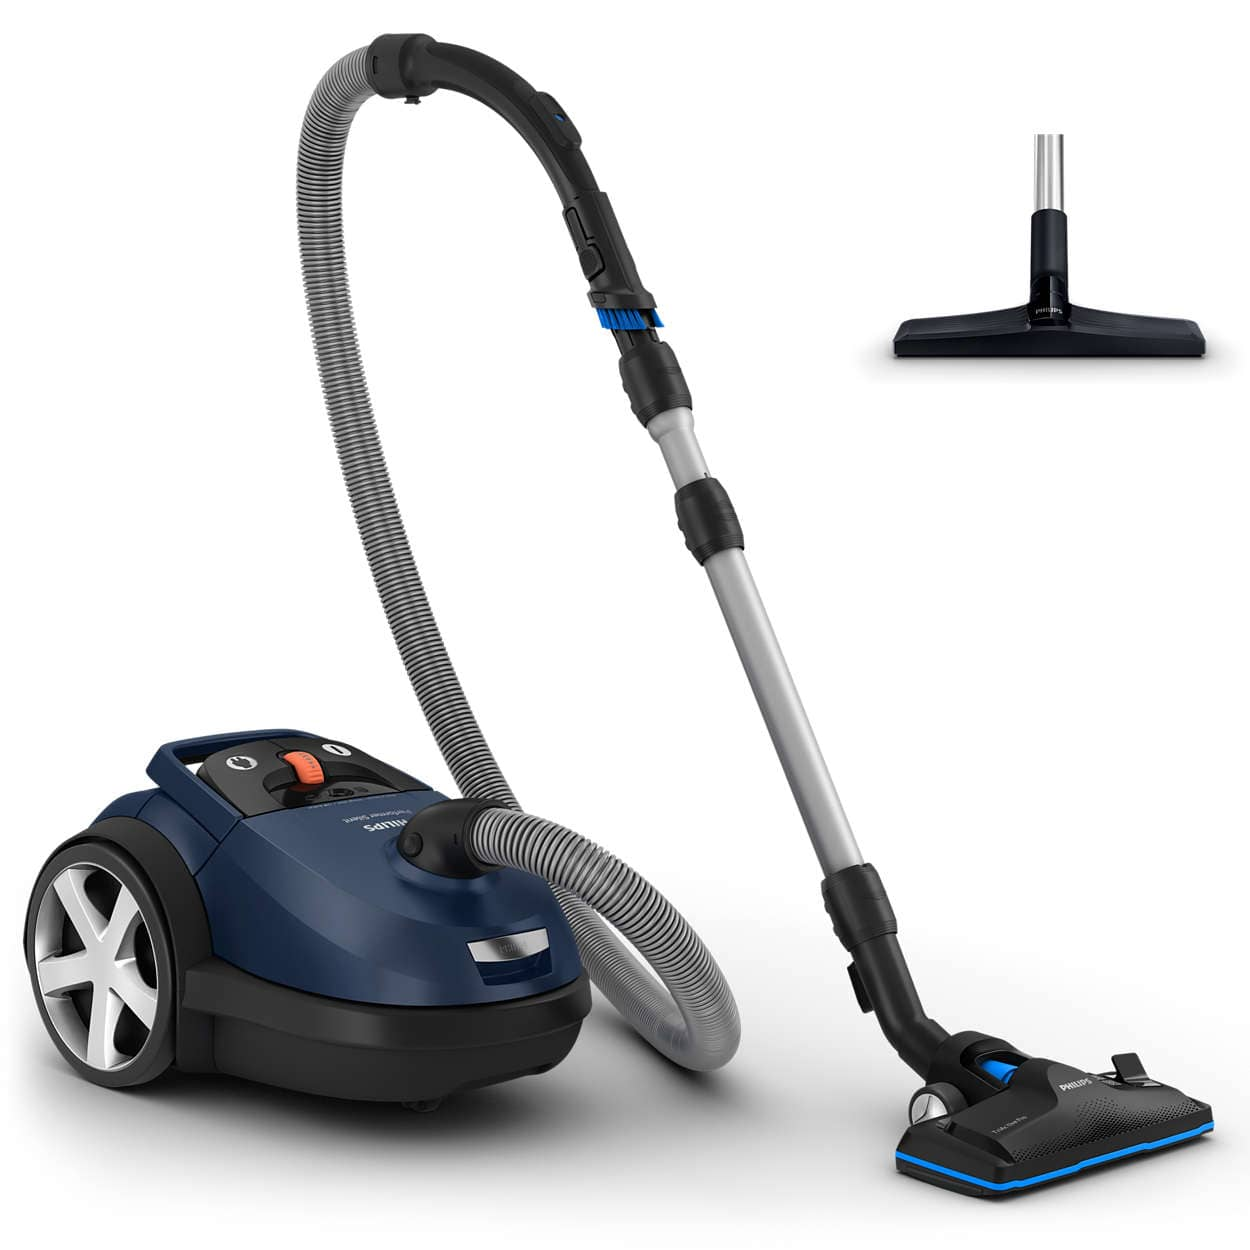 Philips Performer Silent vacuum cleaner